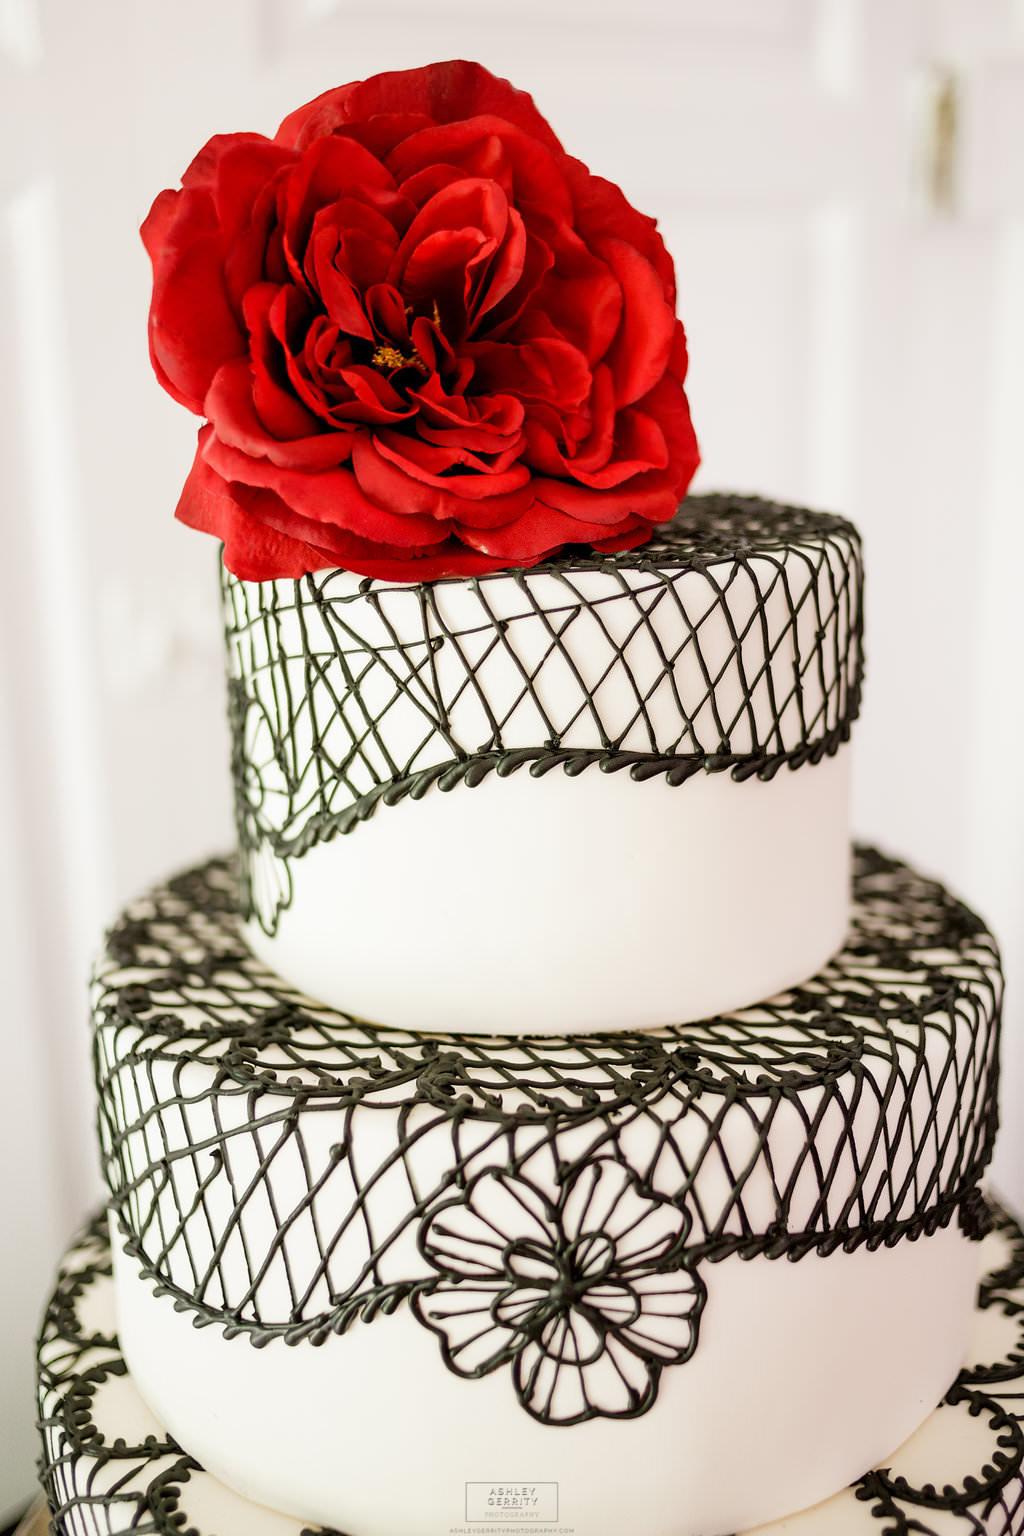 32 Spanish Rose Wedding Cake Black Lace Red Rose Chester County Weddings.jpg